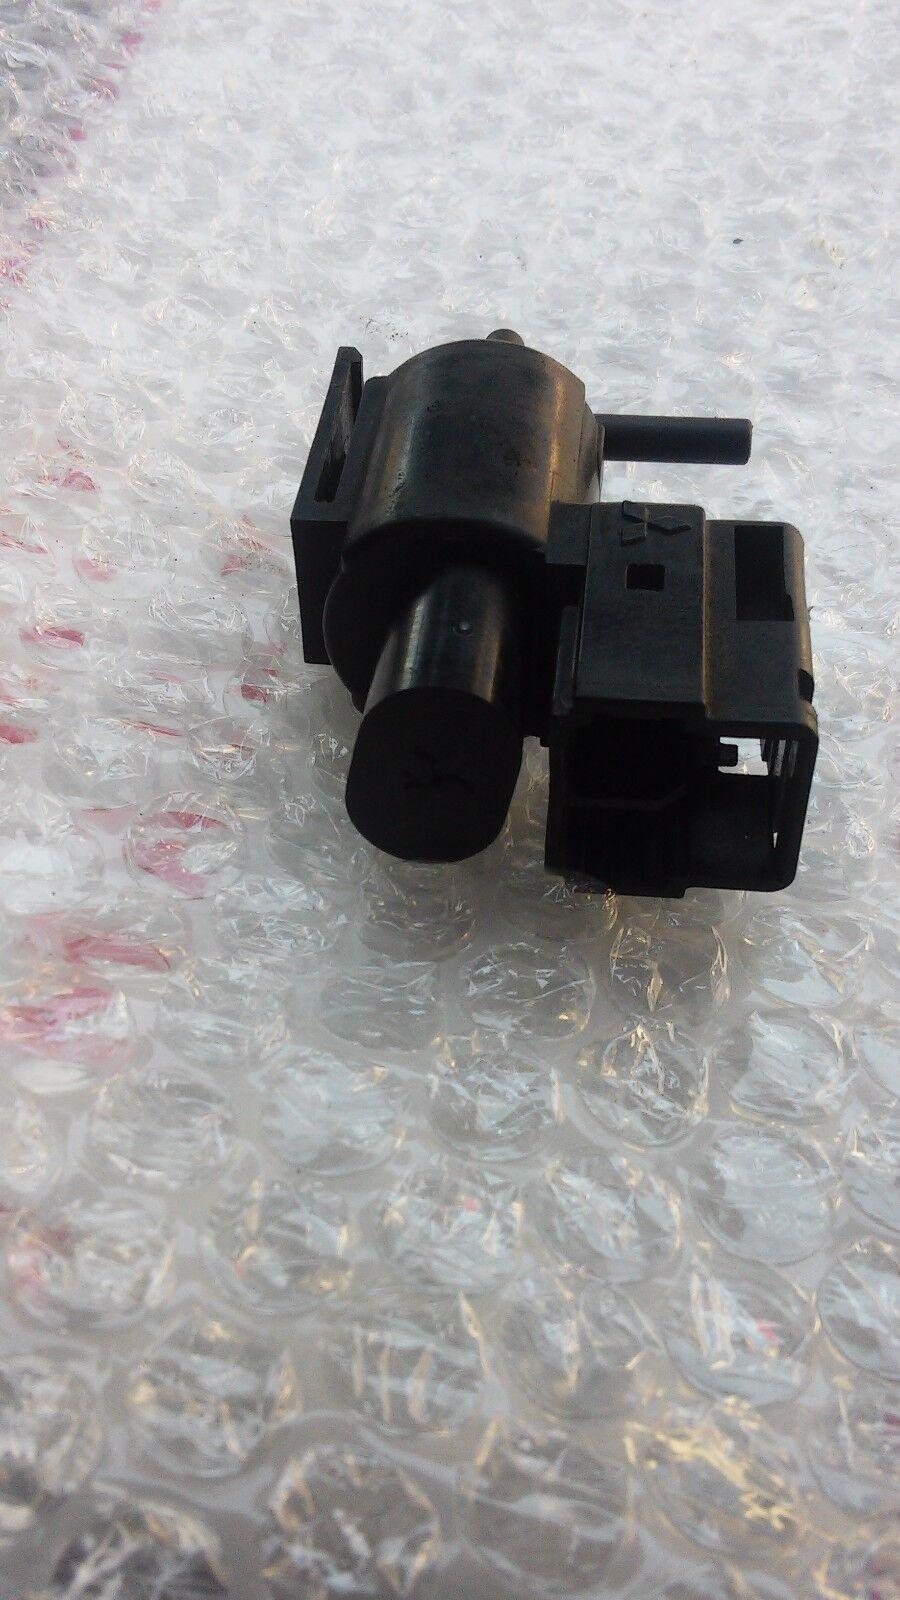 04 08 Mazda Rx8 Updated Air Ssv Vdi Vfad Solenoid Codes P2259 P2260